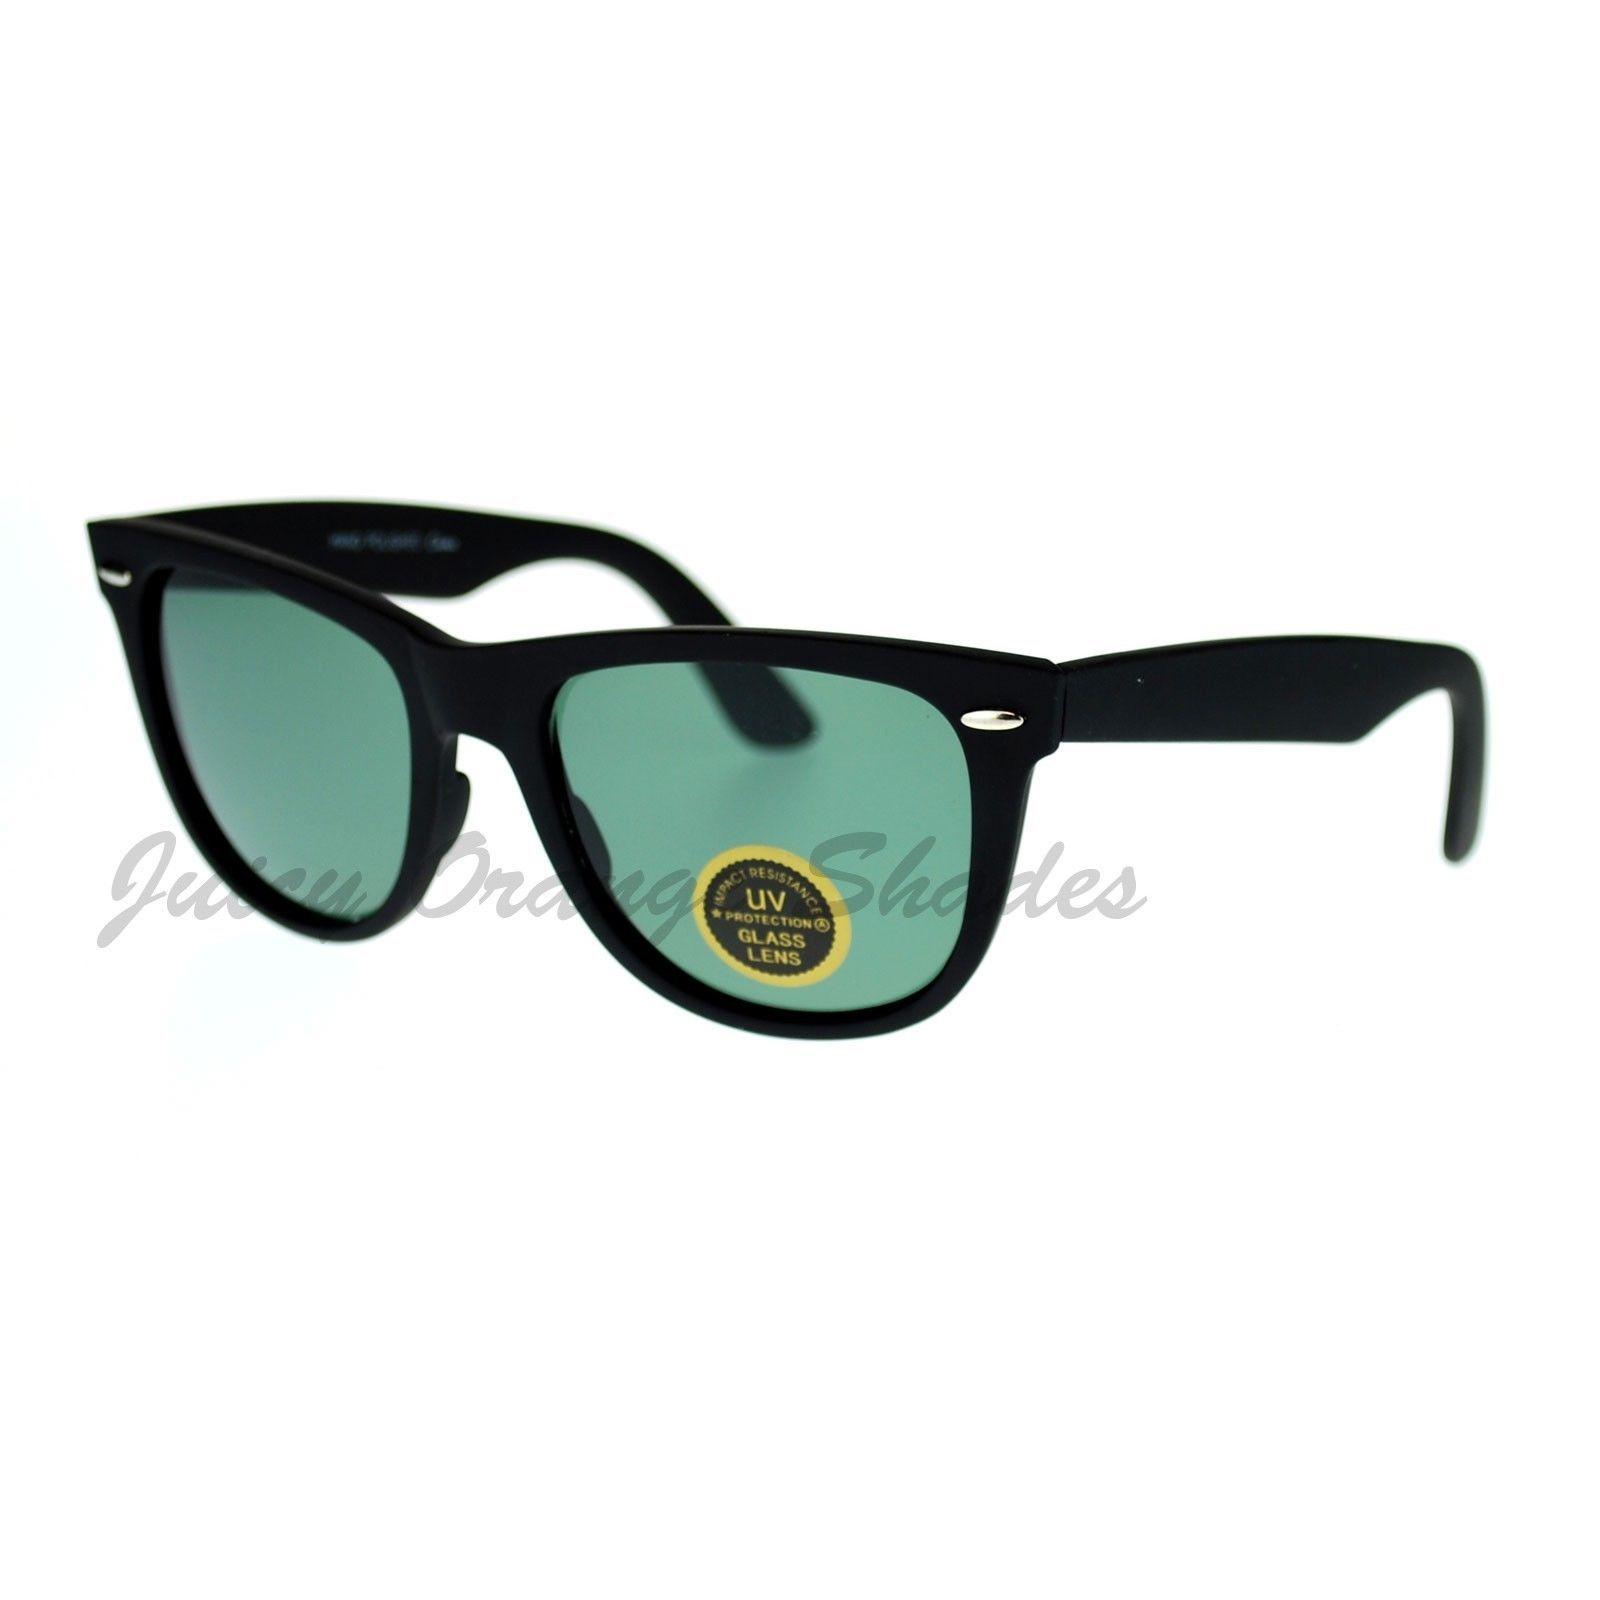 Glass Lens Sunglasses Soft Matte Finish Classic Square Black